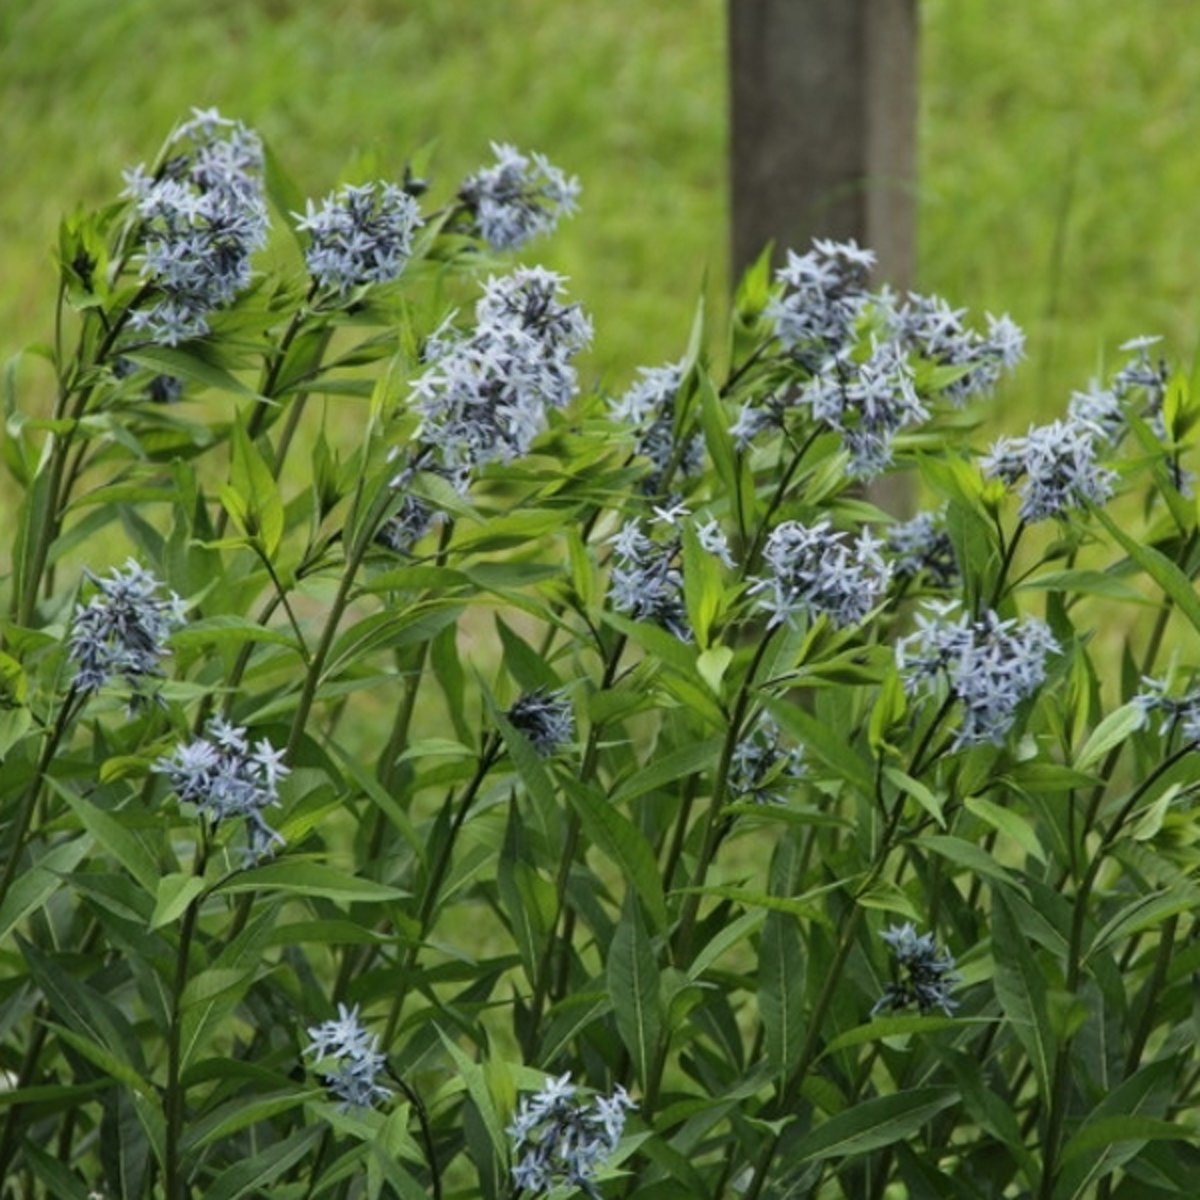 6 x Amsonia Tabernaemontana - Blauwe ster/stermaagdenpalm pot 9x9 cm kopen